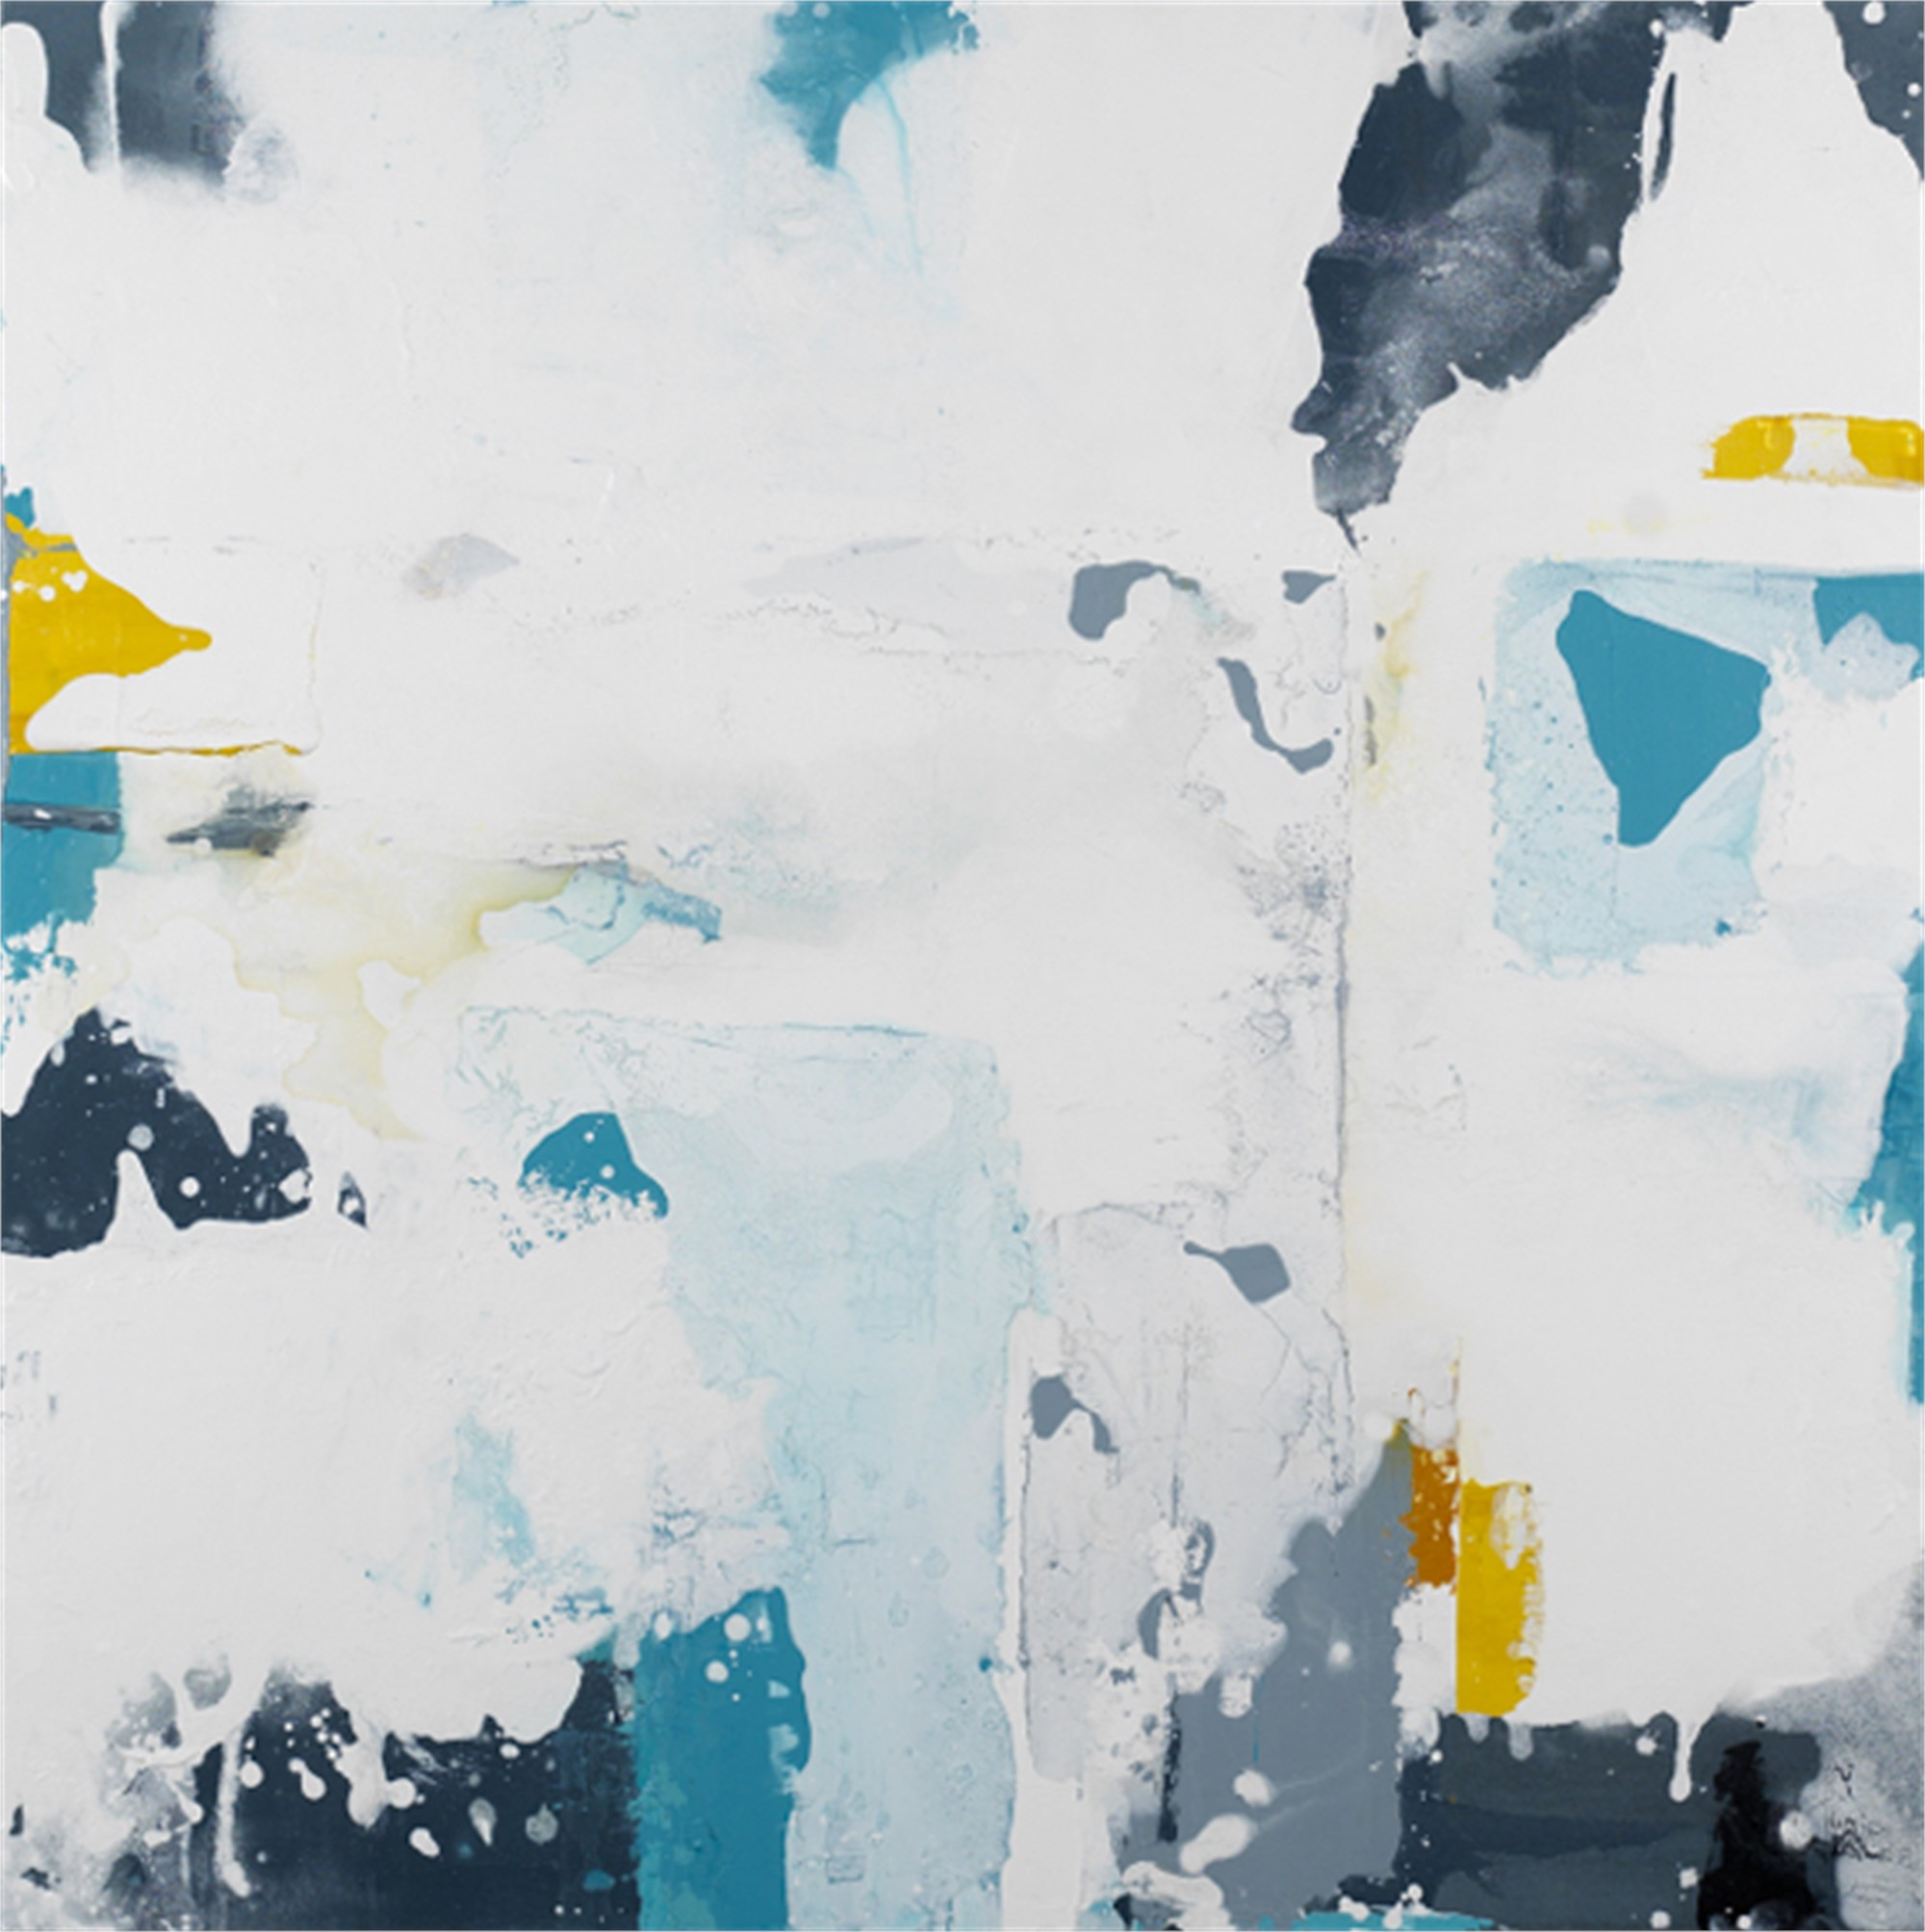 Astratto by John Schuyler